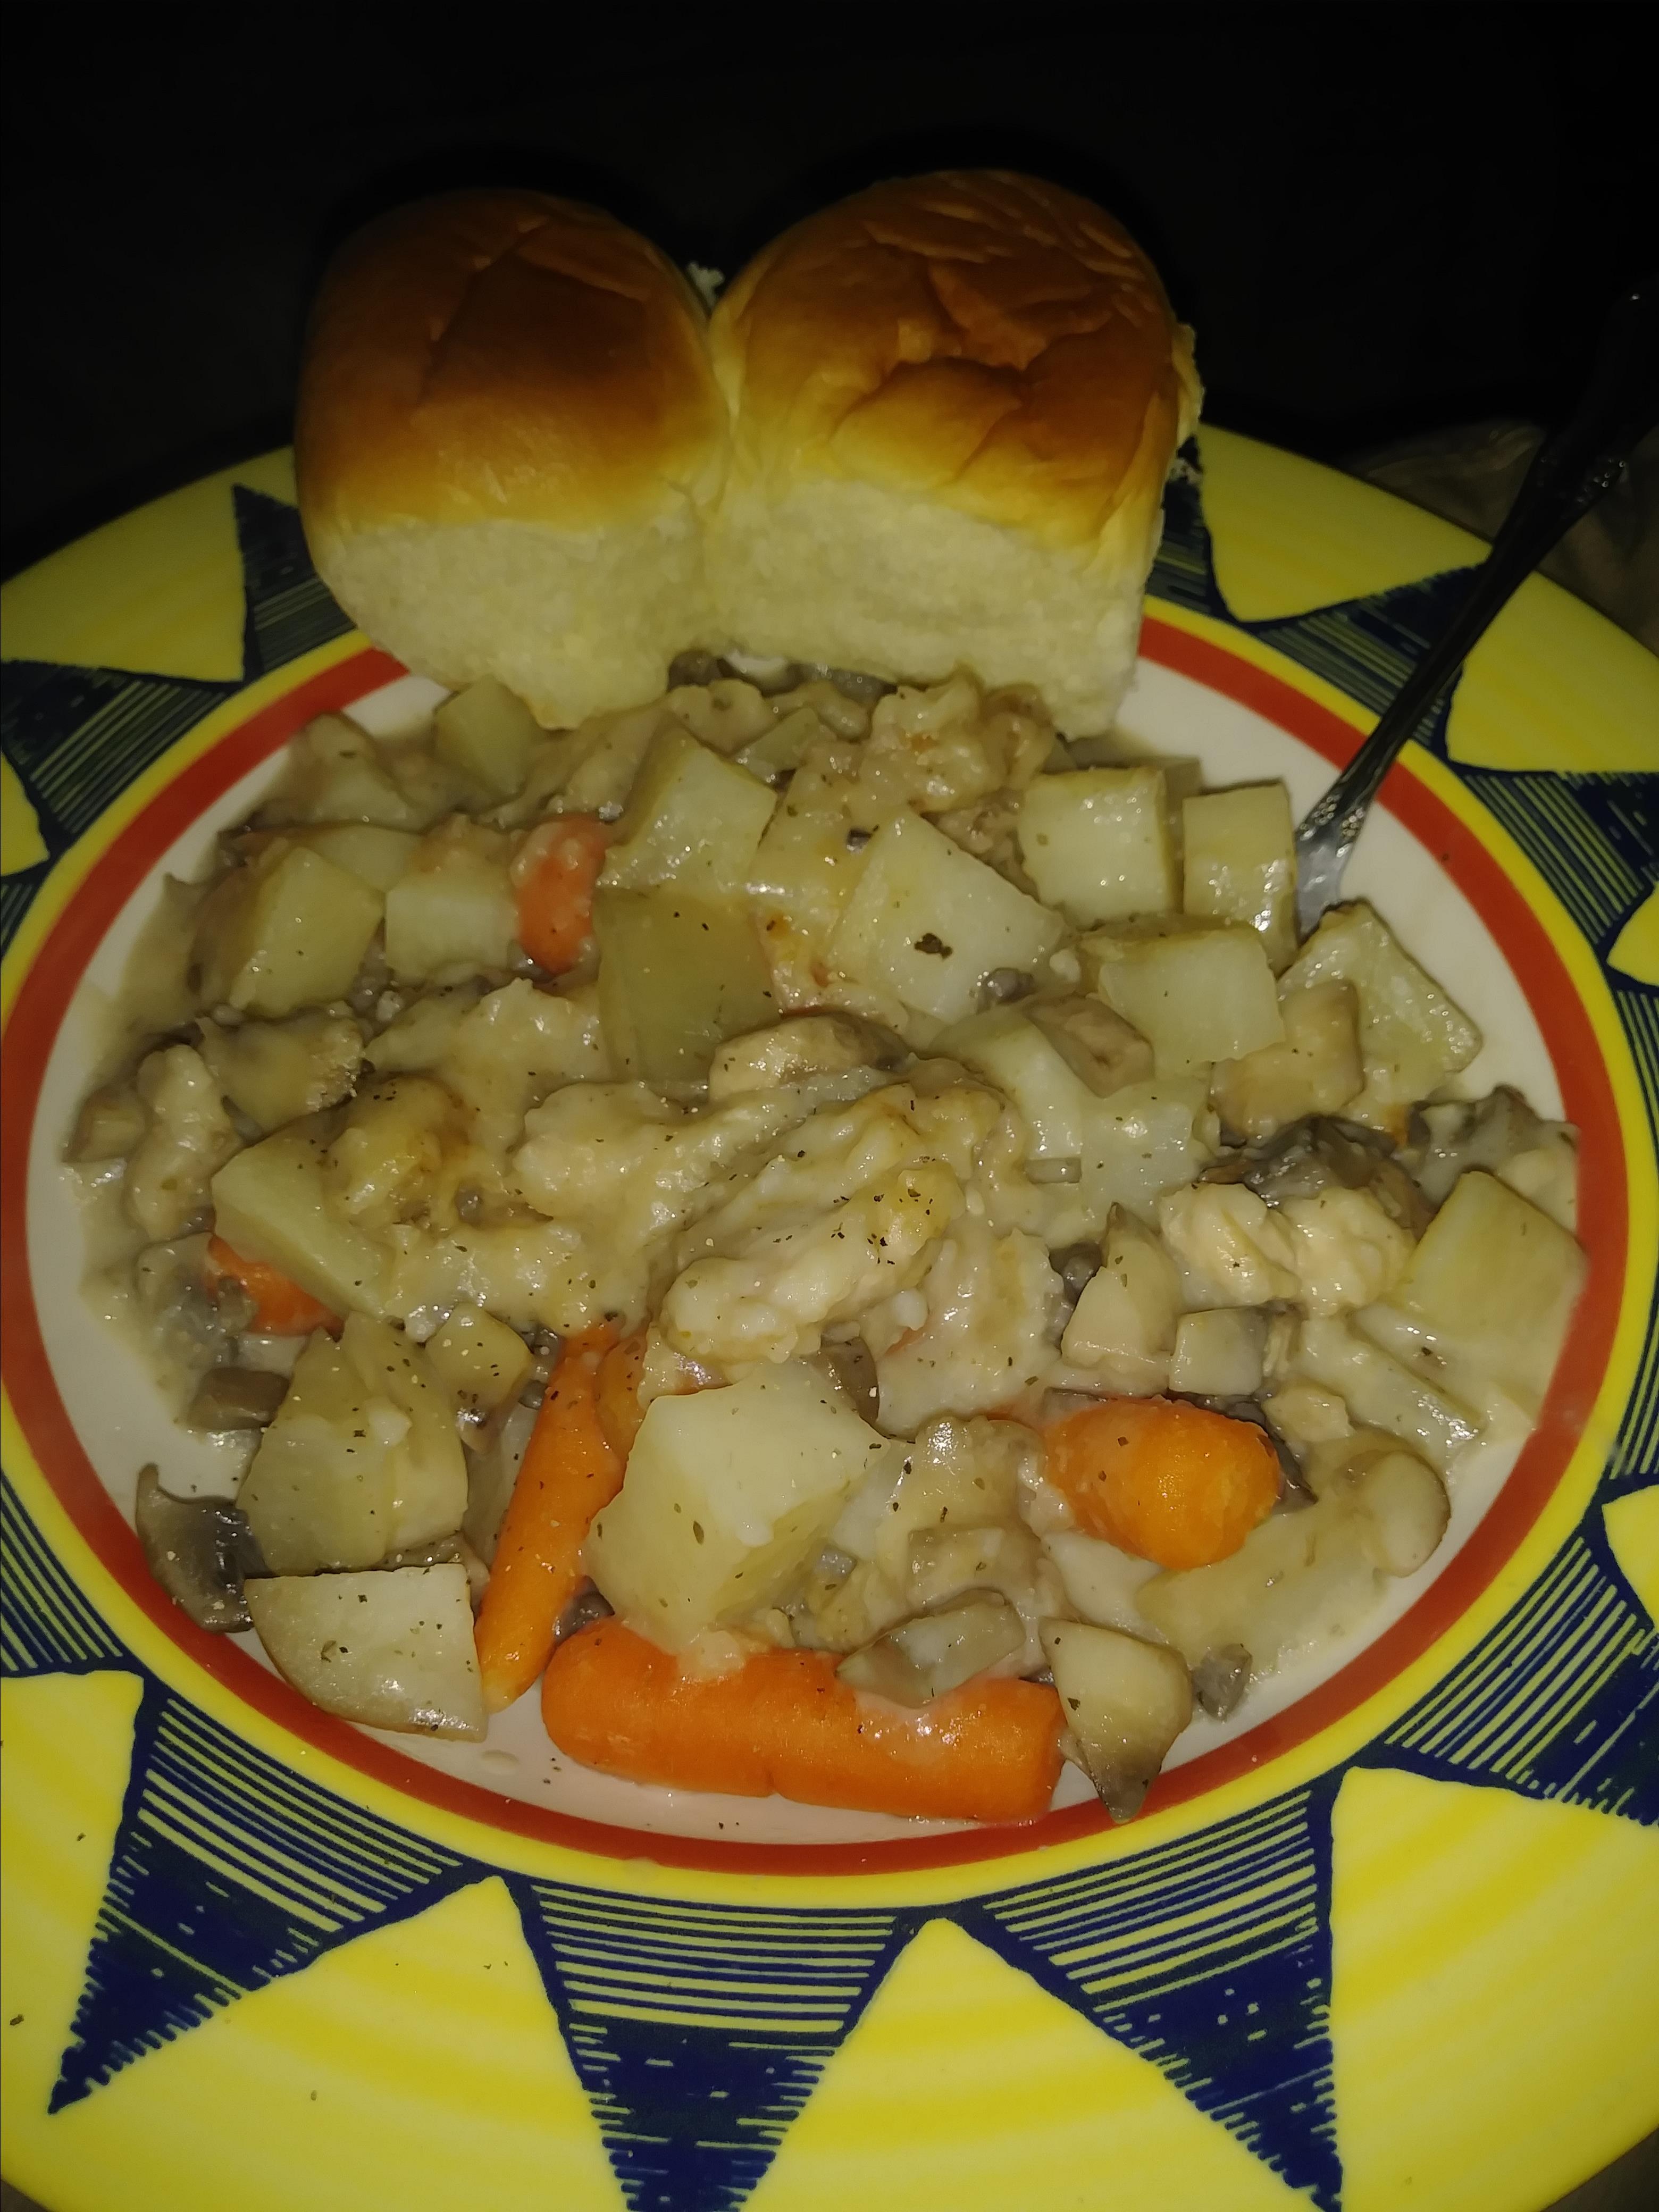 Braised Rabbit with Mushroom Sauce